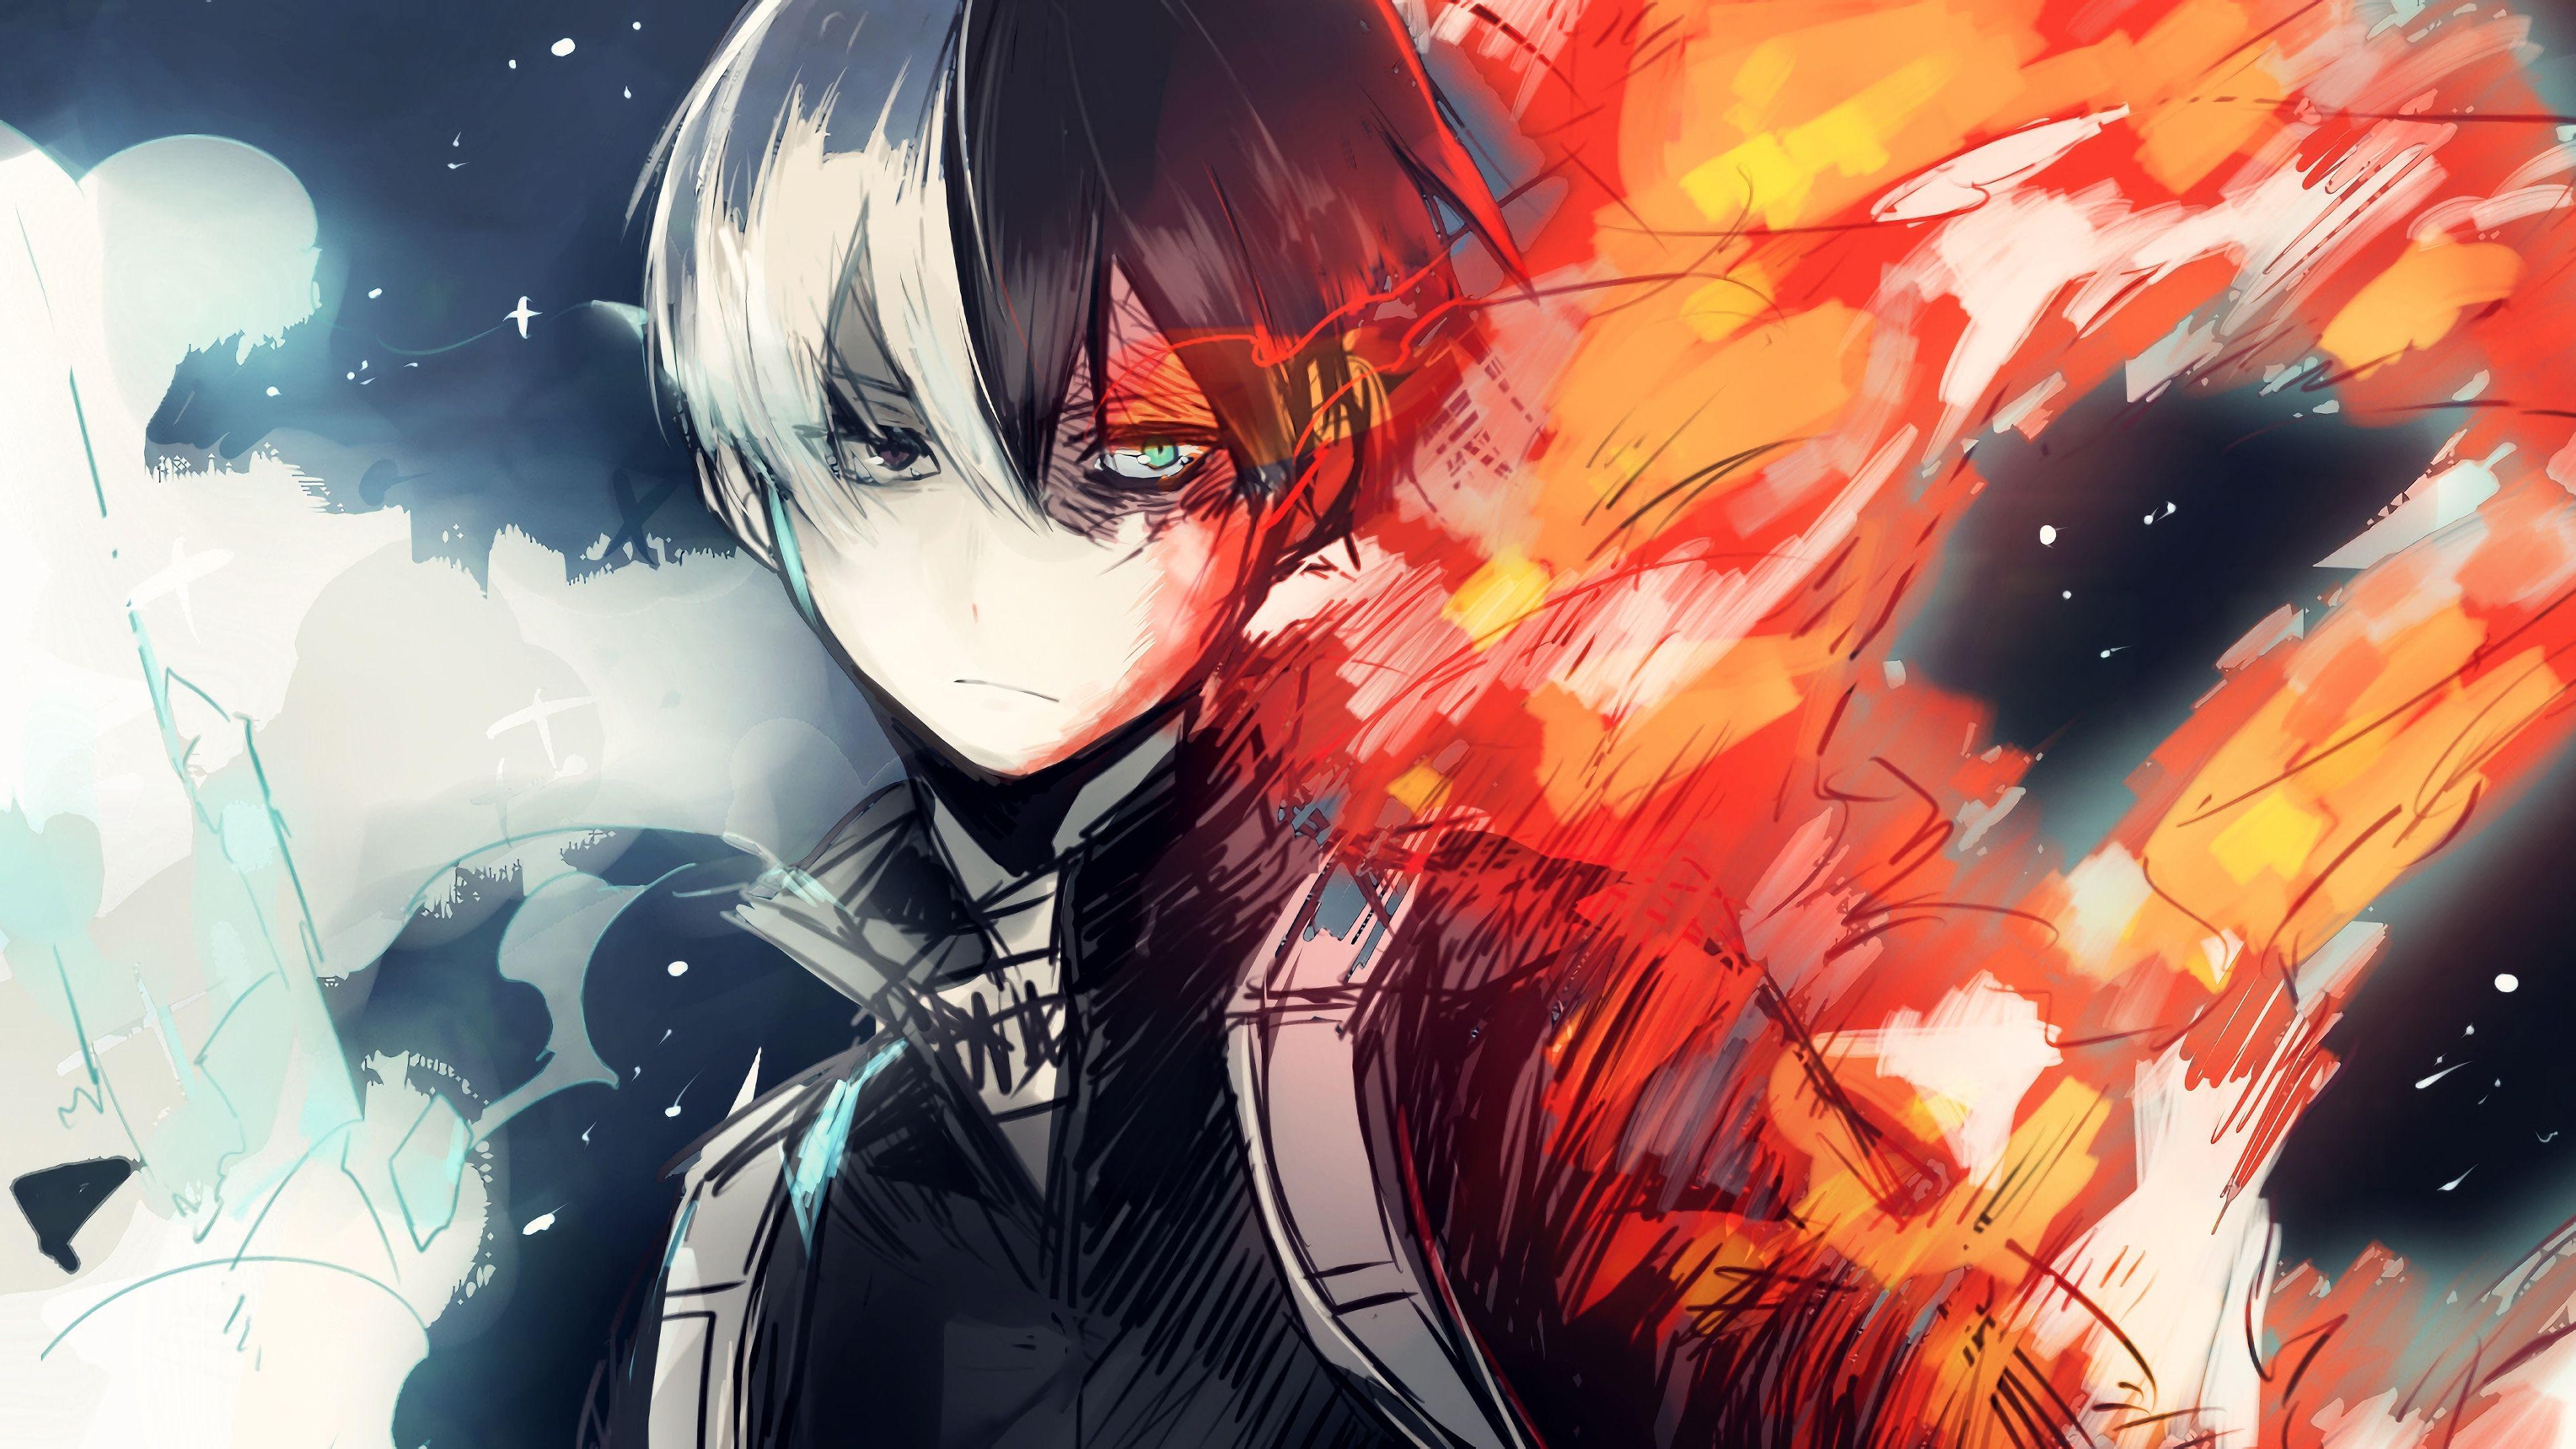 Uraraka deku shouto todoroki my hero academia hd anime 4k. Aesthetic Todoroki PC Wallpapers - Wallpaper Cave